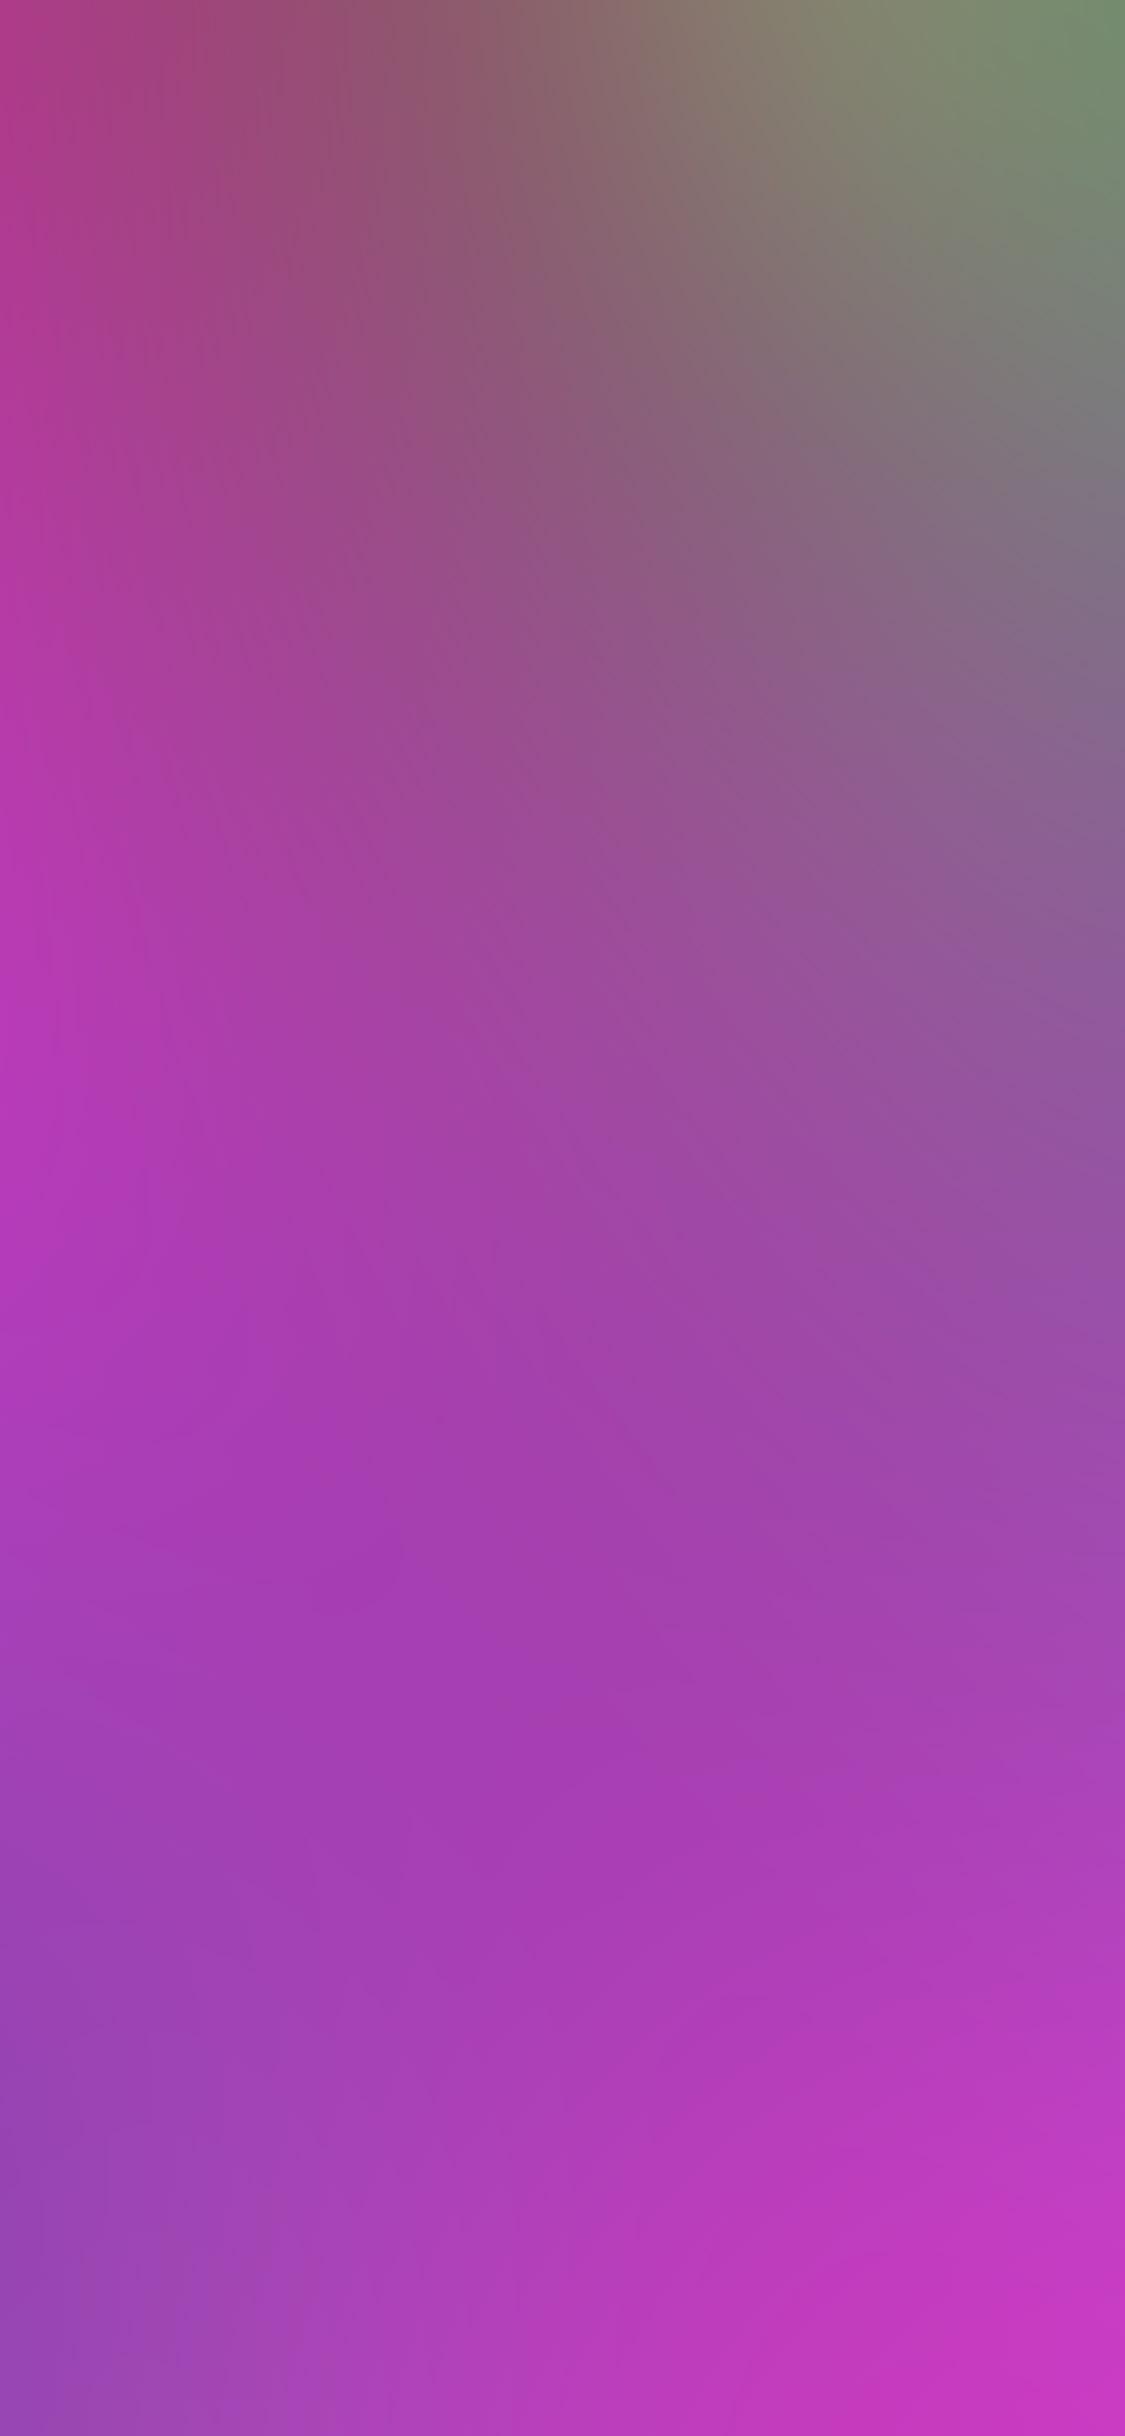 iPhonexpapers.com-Apple-iPhone-wallpaper-sn70-hot-purple-blur-gradation